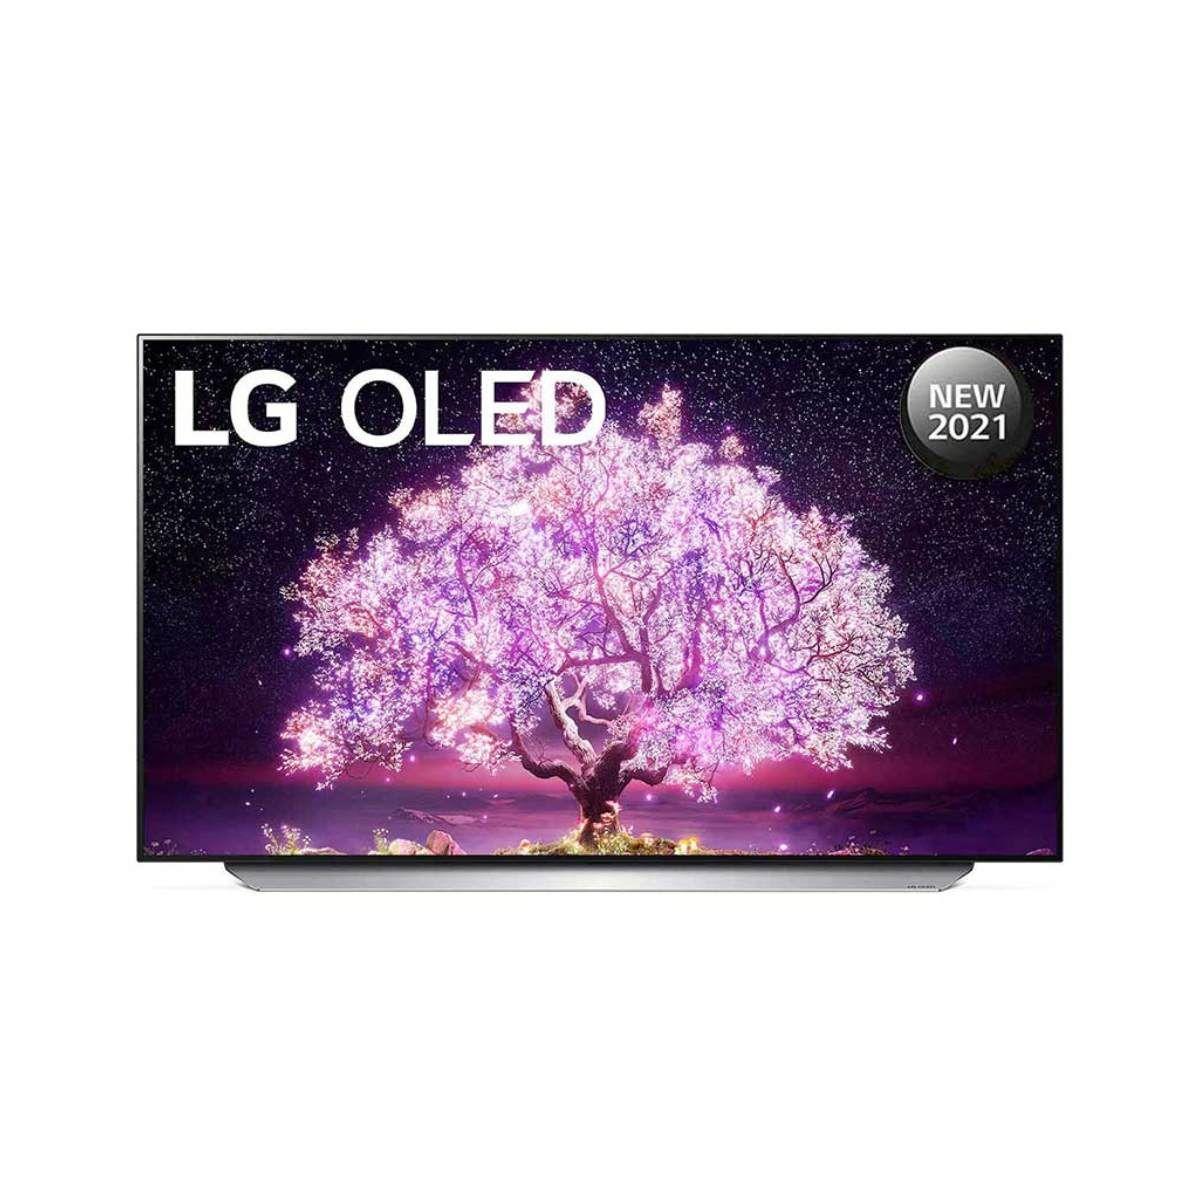 LG C1 55-inch 4K OLED TV